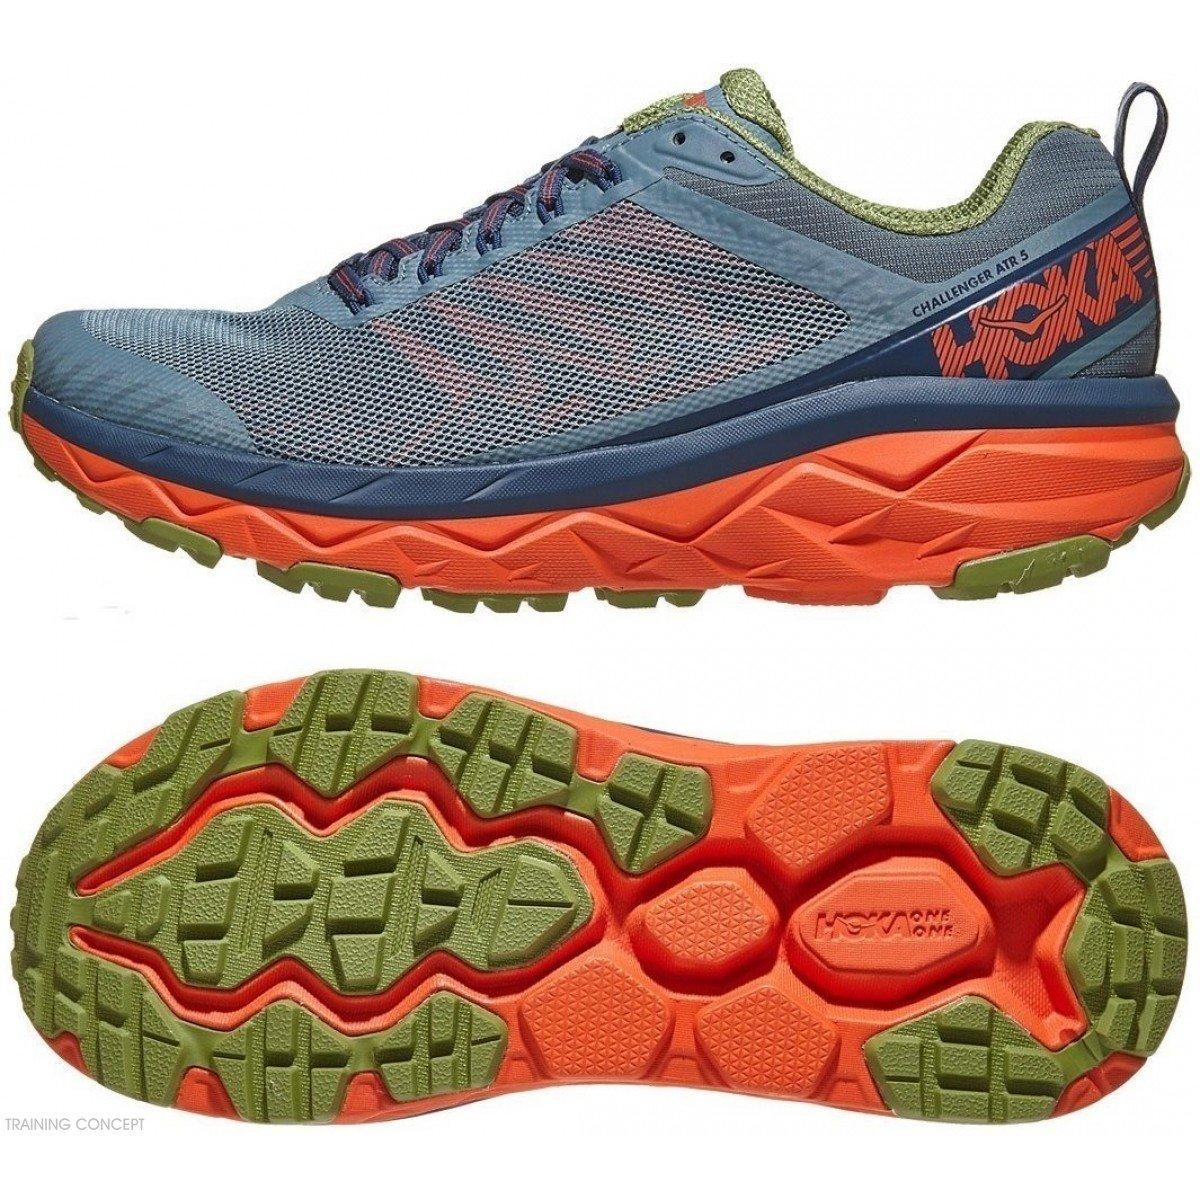 Hommes Chemin Pour Route Chaussures De Running Hoka Challenger Et ul15cTKJ3F